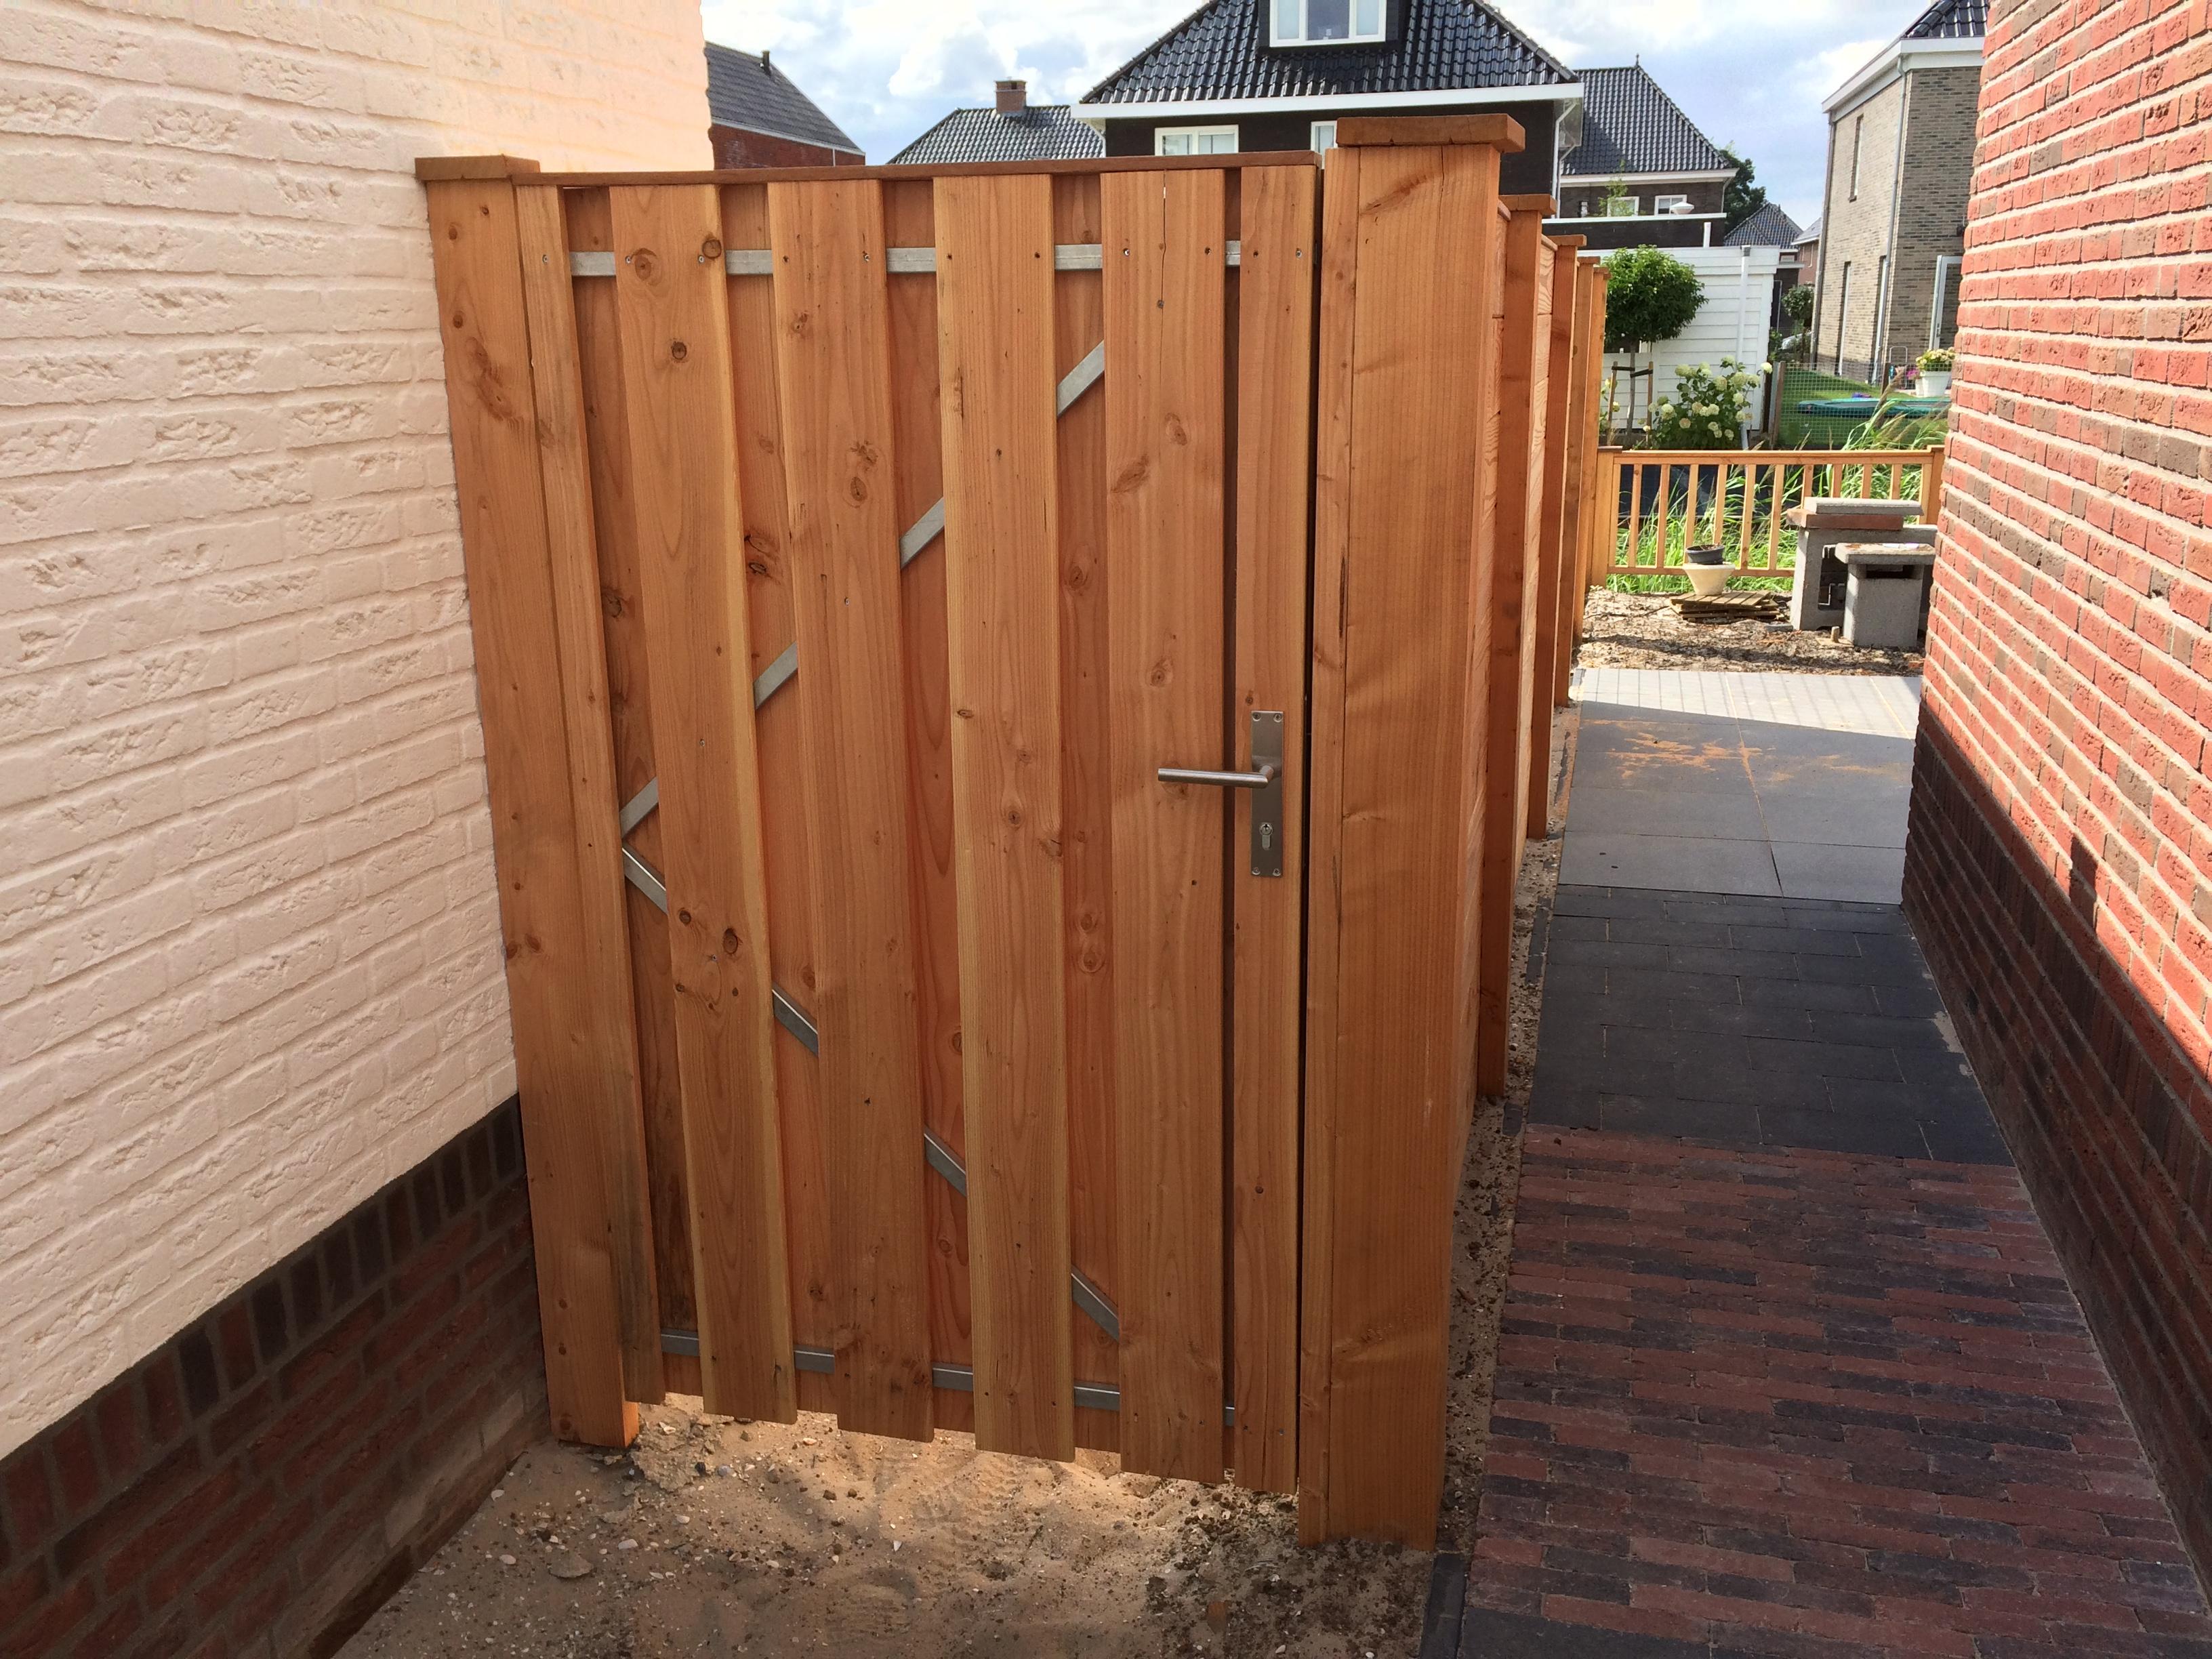 douglashouten schuttingen en poortdeuren